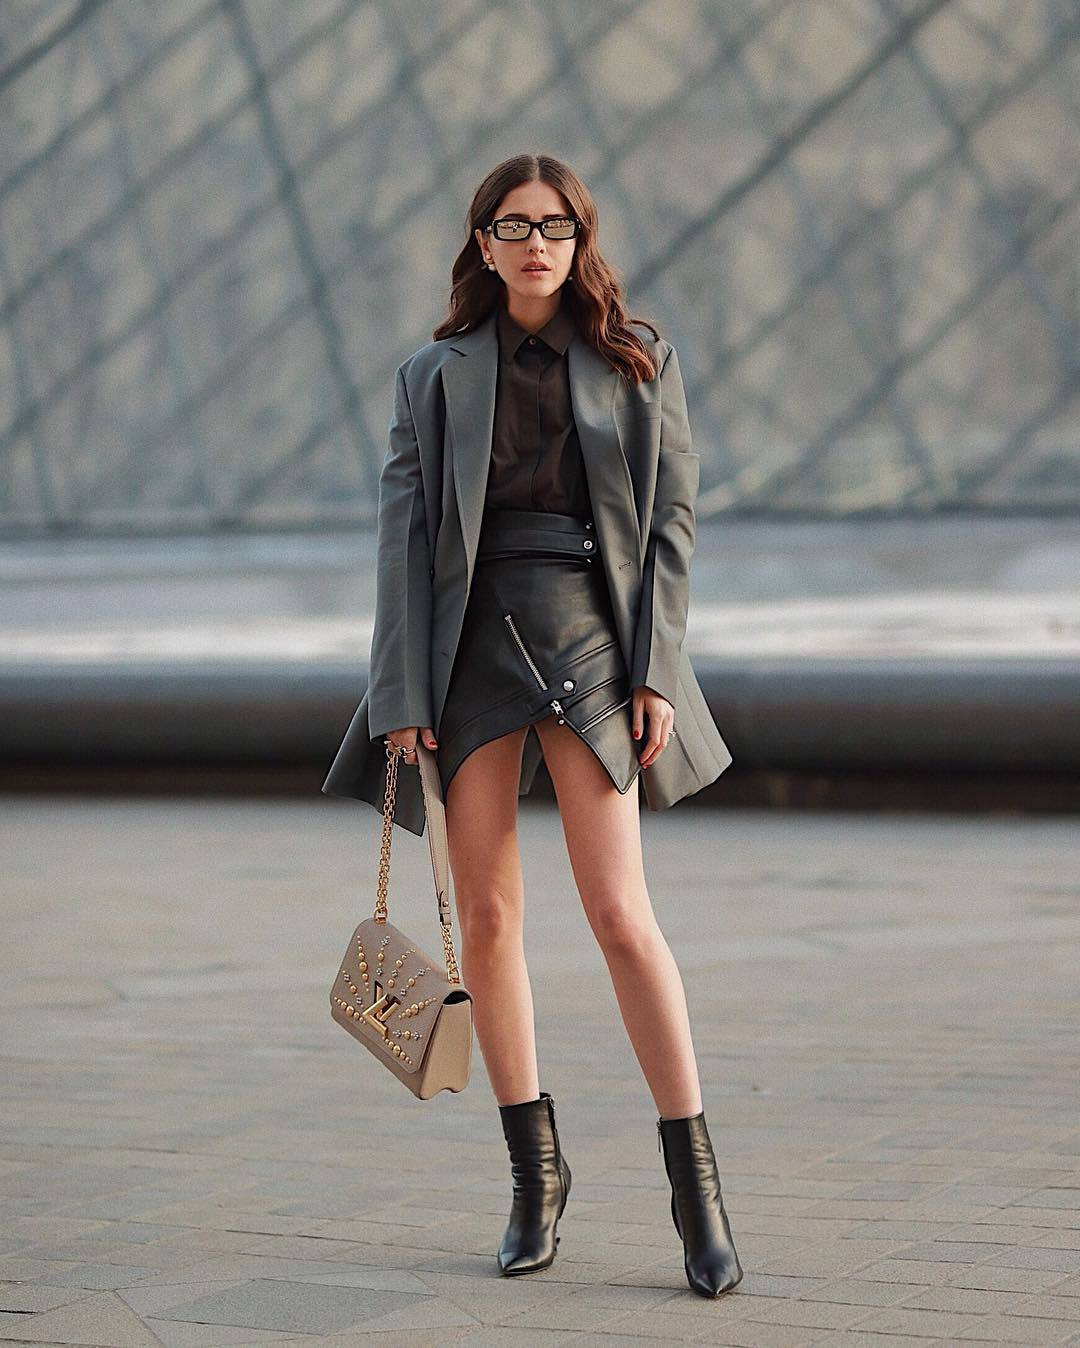 jacket grey blazer prada ankle boots black boots louis vuitton bag black leather skirt shirt